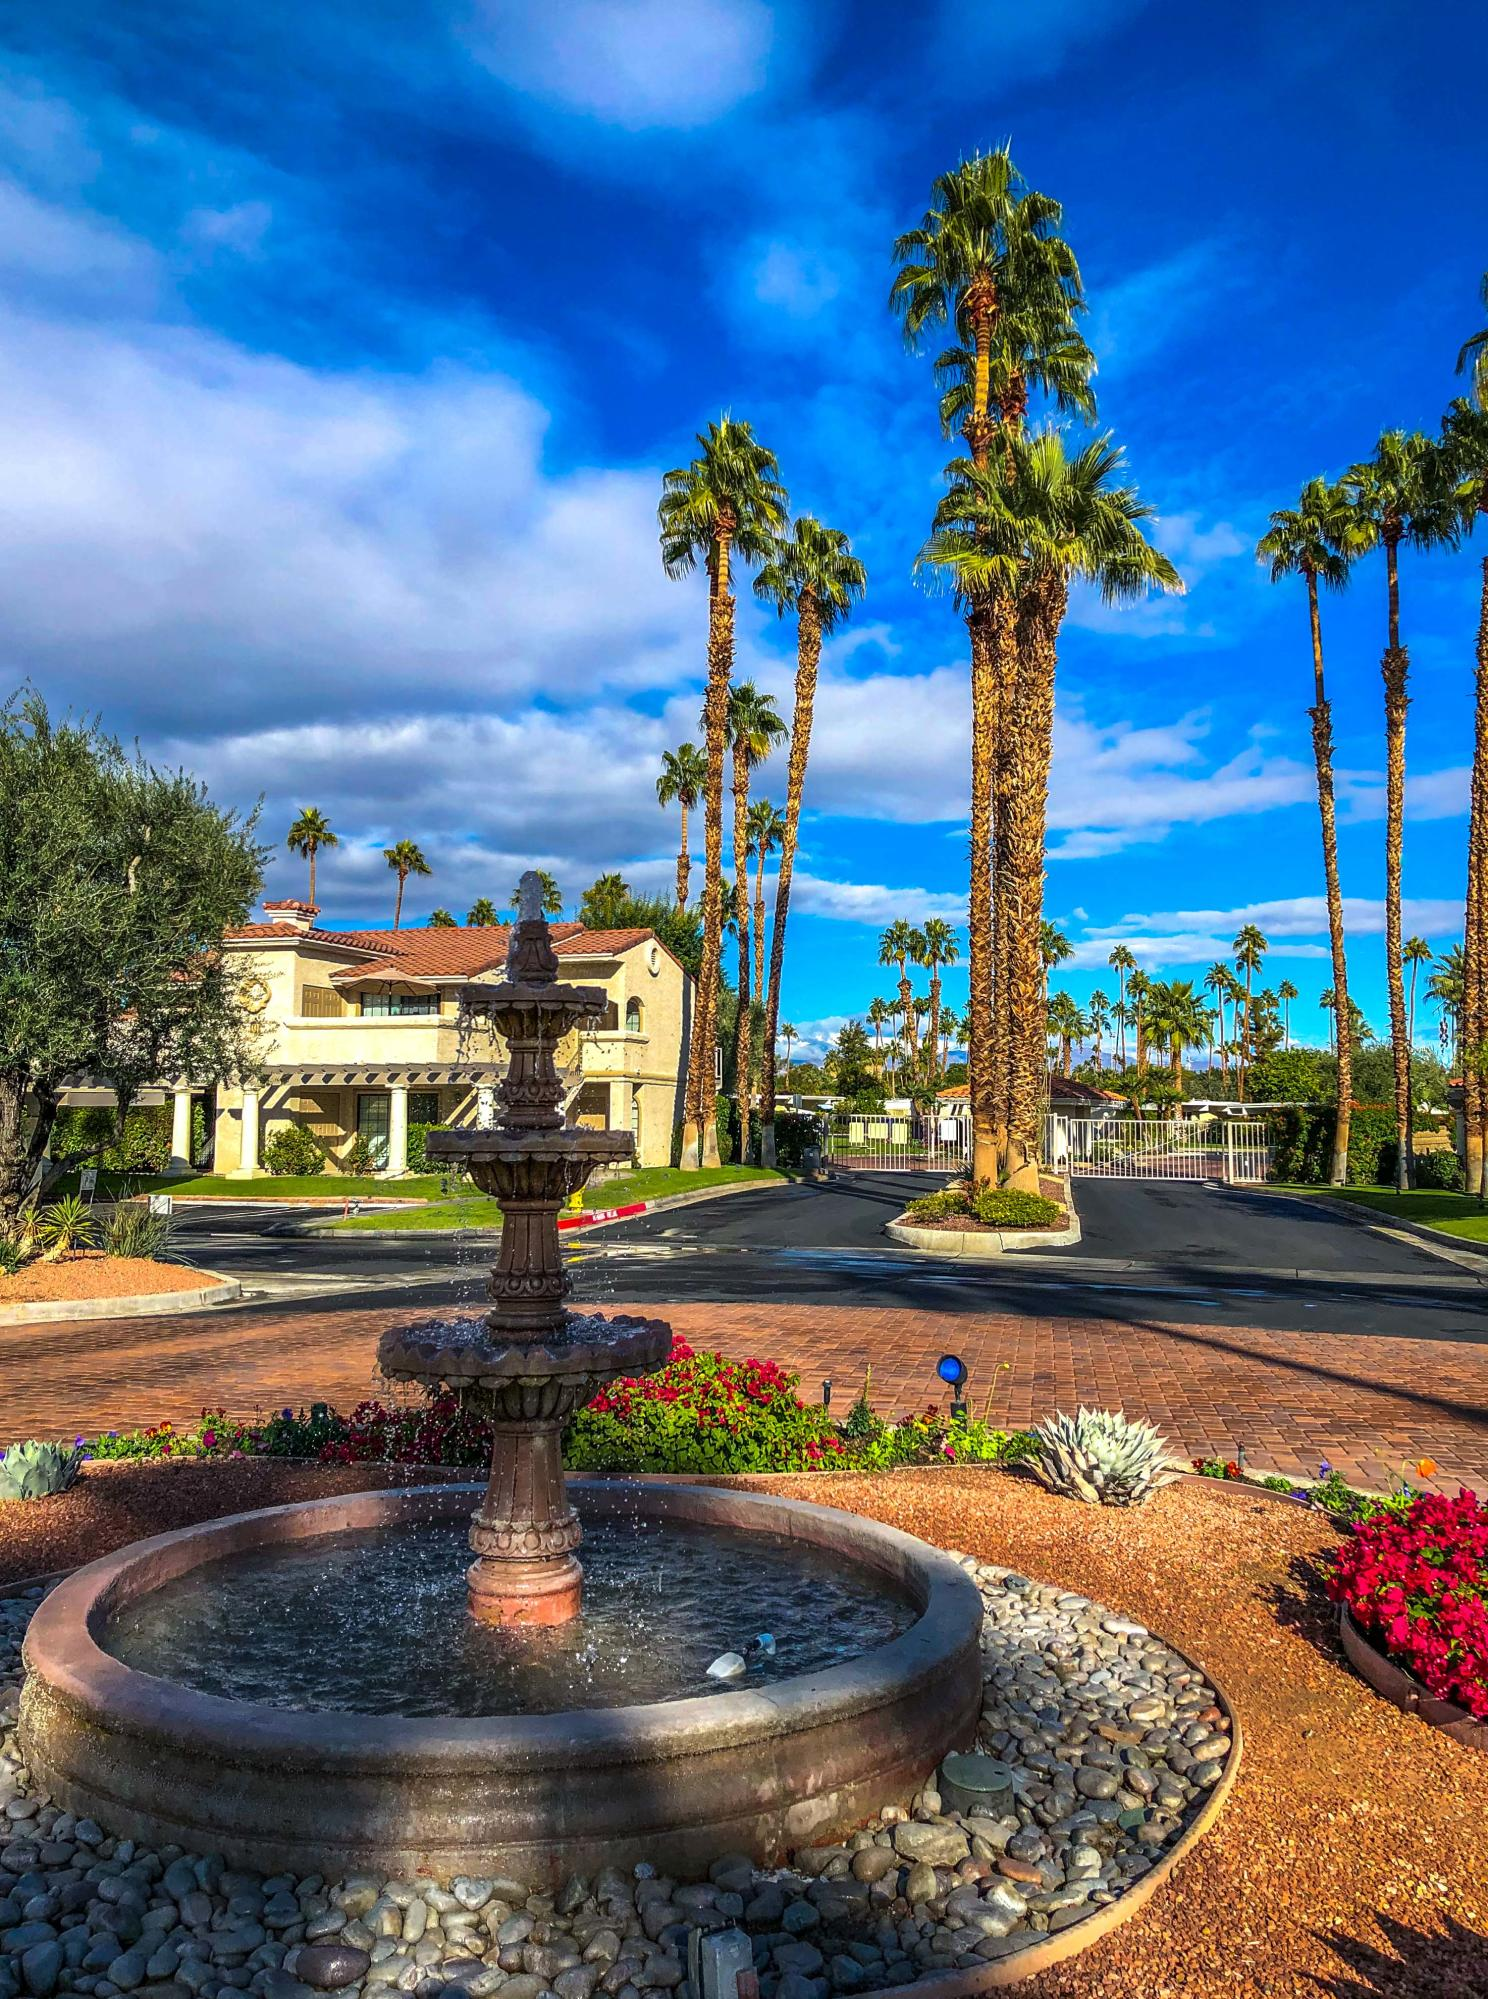 2001 E Camino Parocela, Palm Springs, California 92264, 1 Bedroom Bedrooms, ,1 BathroomBathrooms,Residential,For Sale,2001 E Camino Parocela,219041522